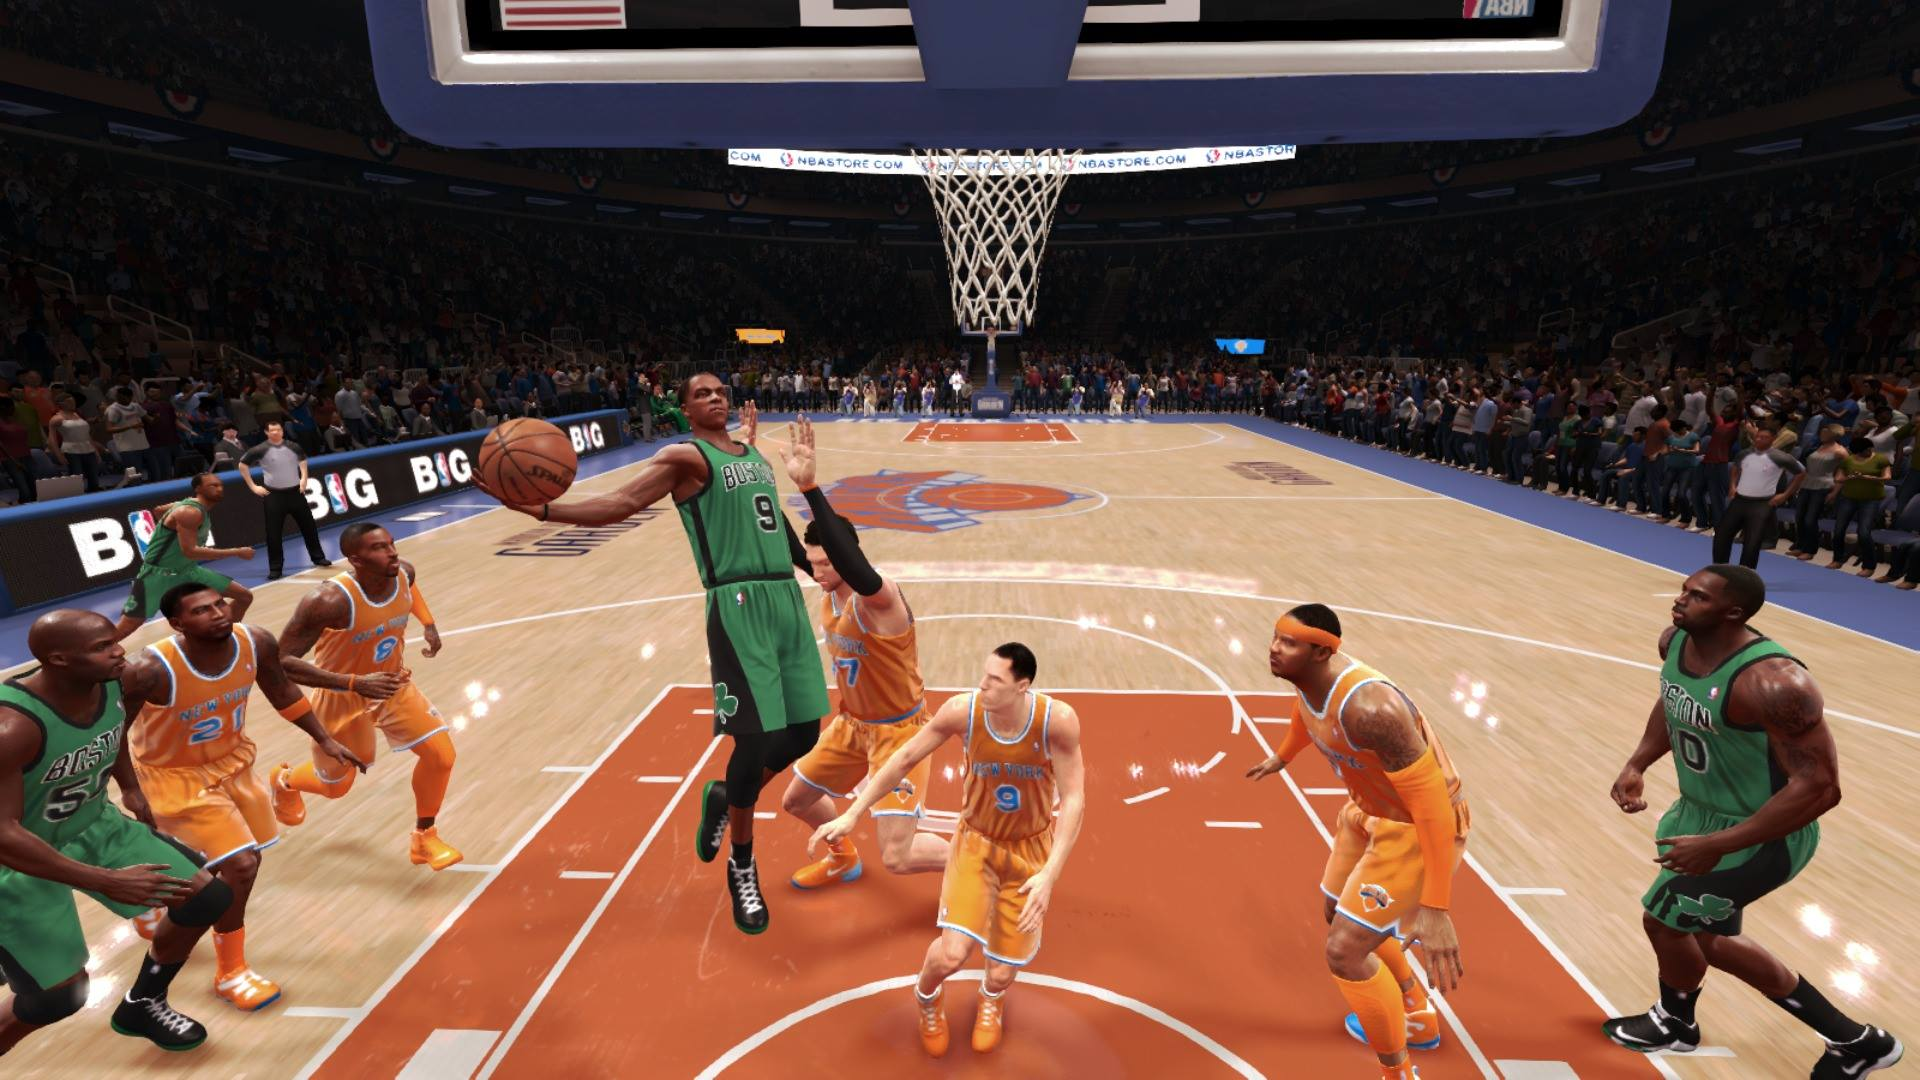 NBA Live 14 Rondo Layup